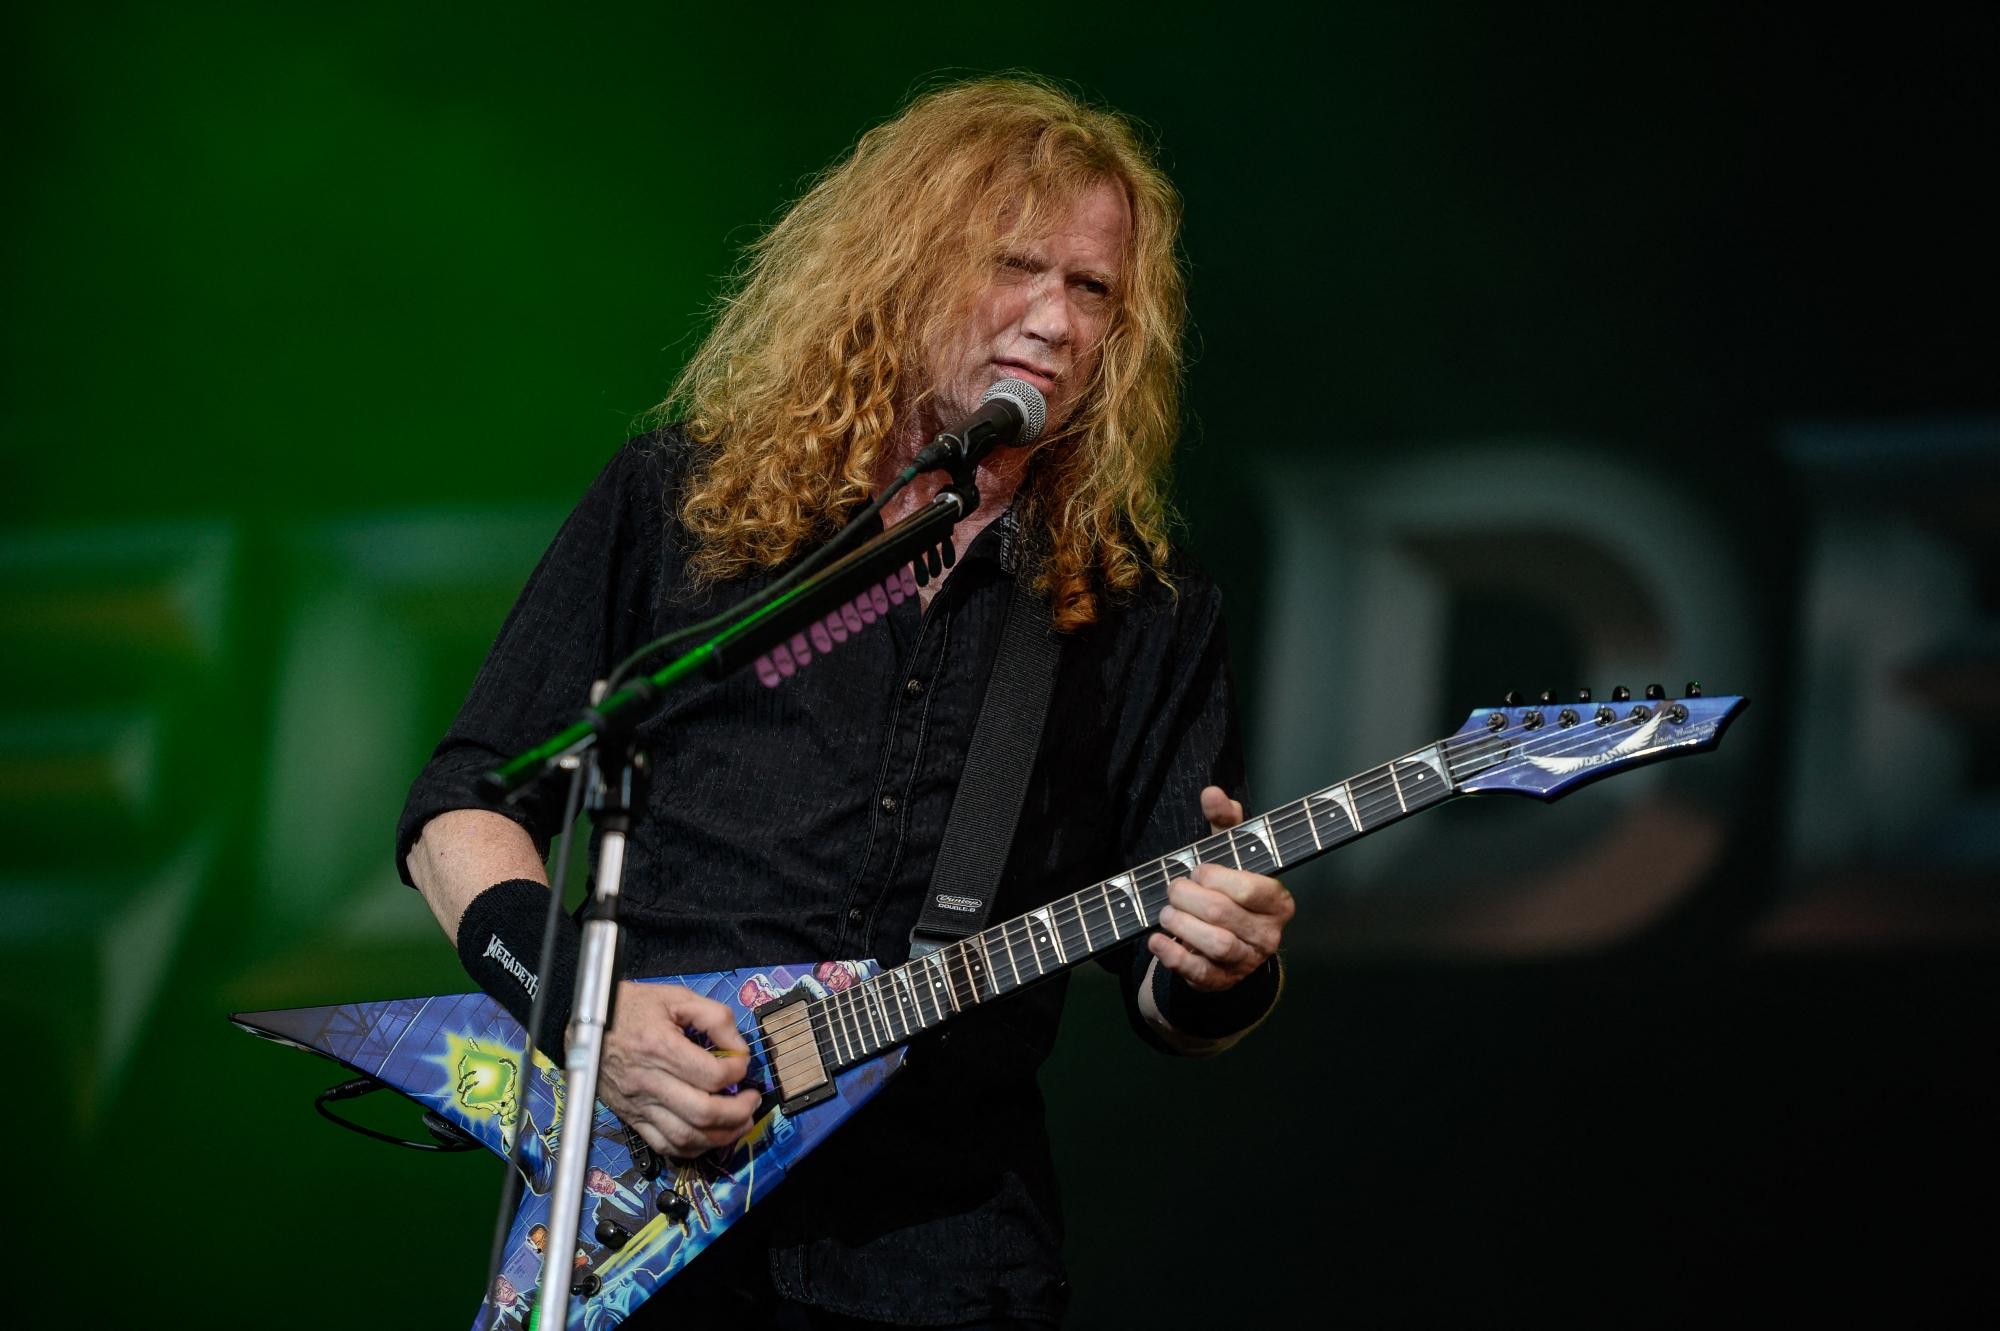 Dave Mustains atteint d'un cancer — Megadeth